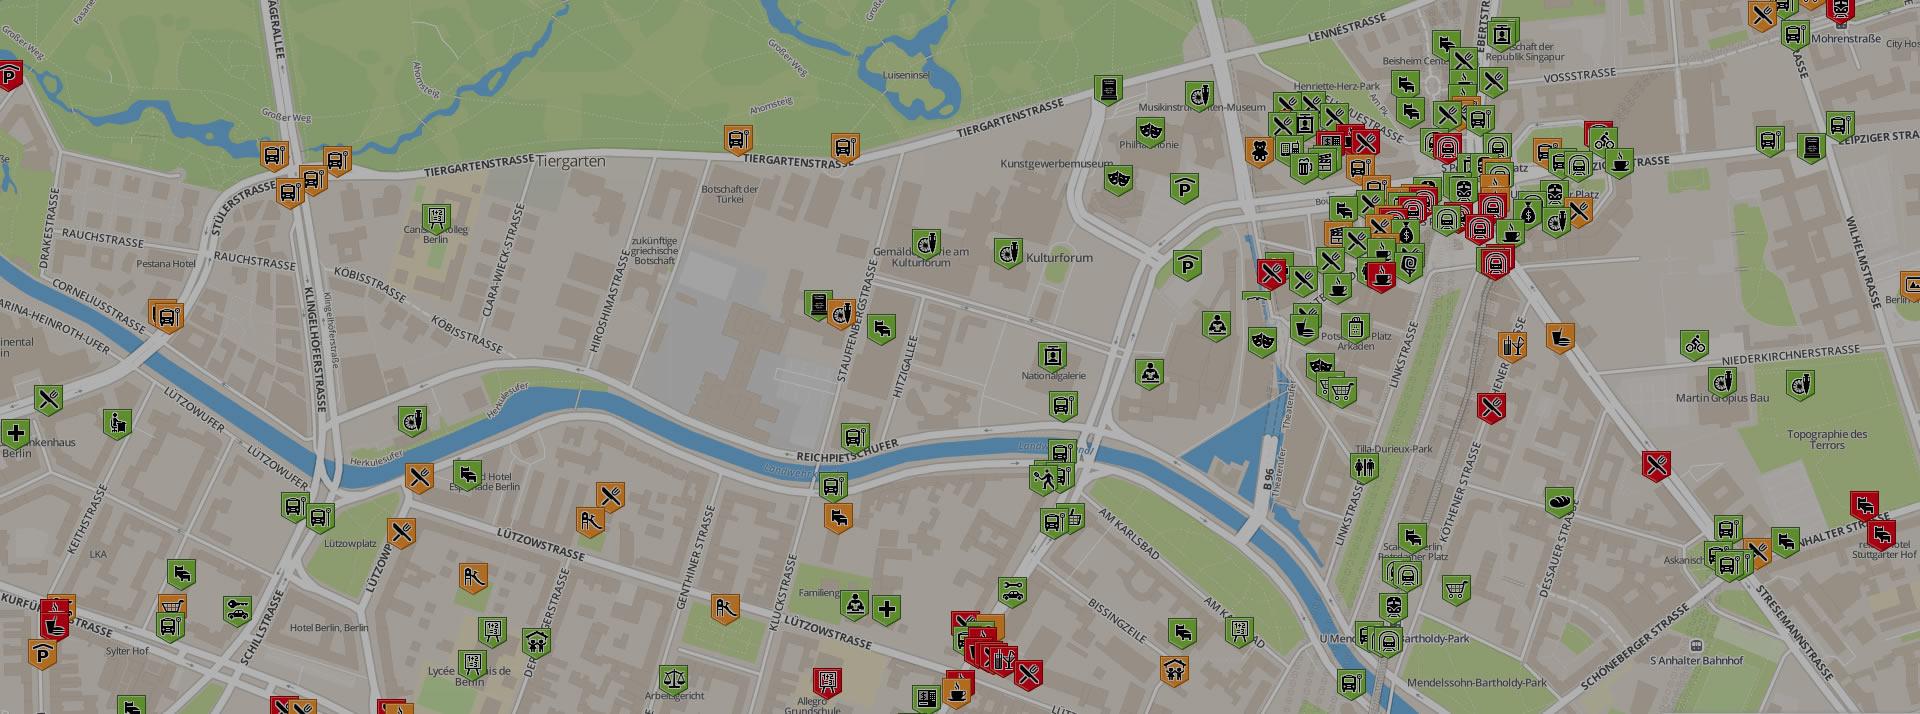 Wheelmap.org